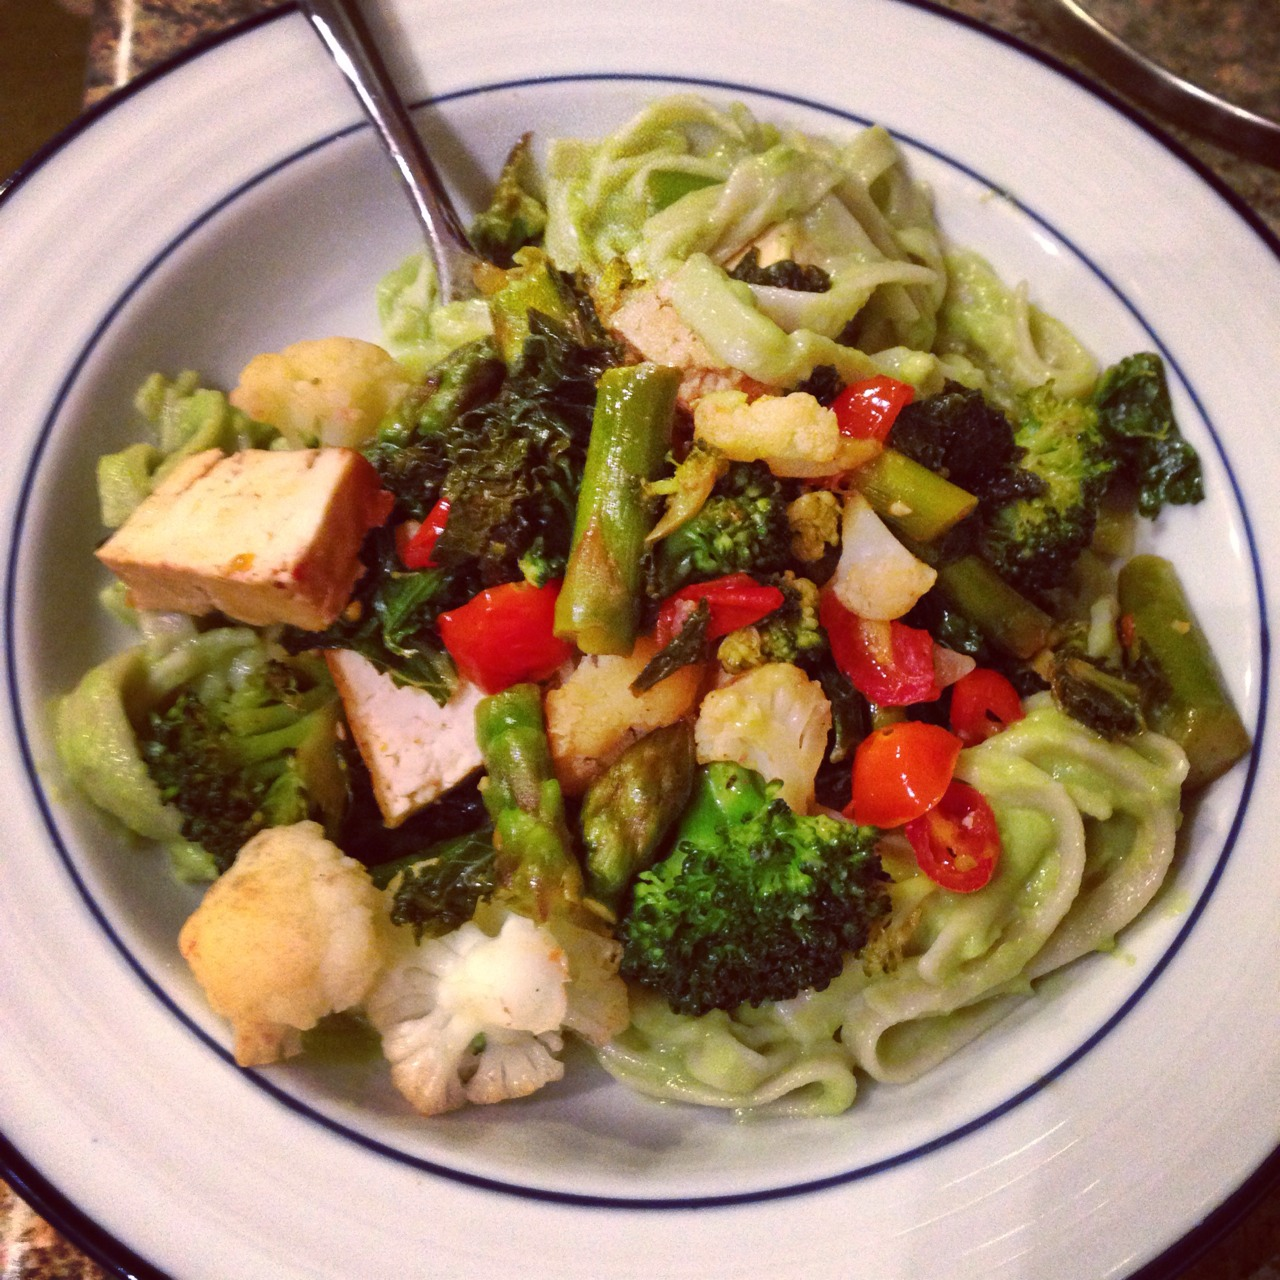 Dinner is served! Creamy avocado quinoa pasta w/ tons of veggies and tofu. GF & DF